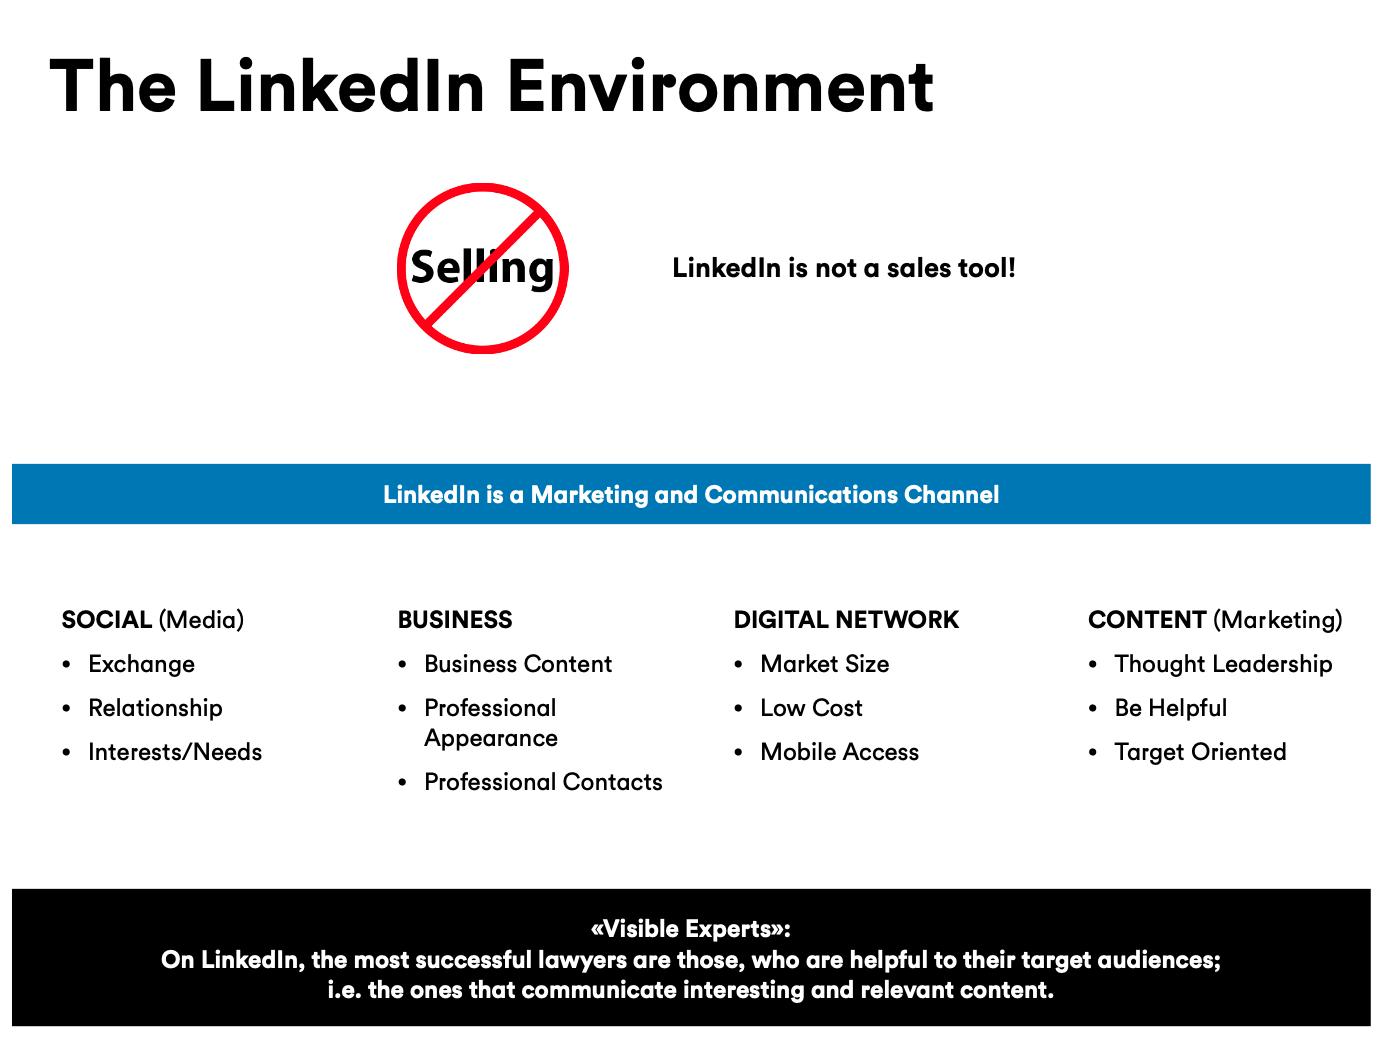 LinkedIn Anwalt Kanzlei Lawyer Marketing digital HeadStarterz Tobias Steinemann Philipp Roth Social Media Kommunikation